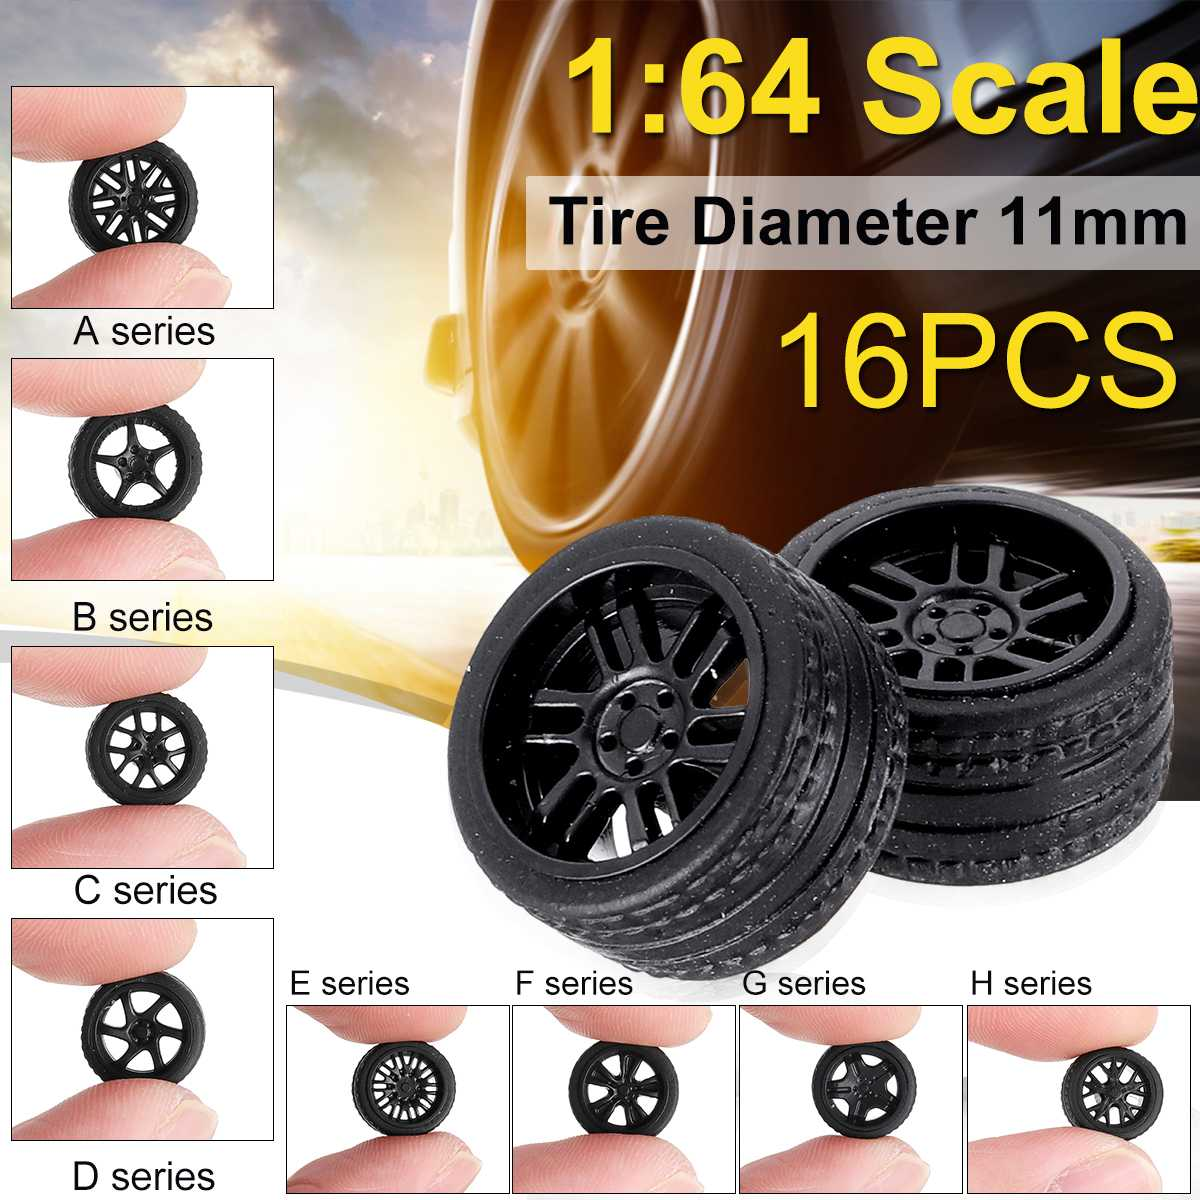 16PCS/Four Boxes ABS Rubber Wheels Tire Set Axles Vehicle Wheels Tire Modified Alloy Car Refit Wheels For 1/64 Vehicle Car Model